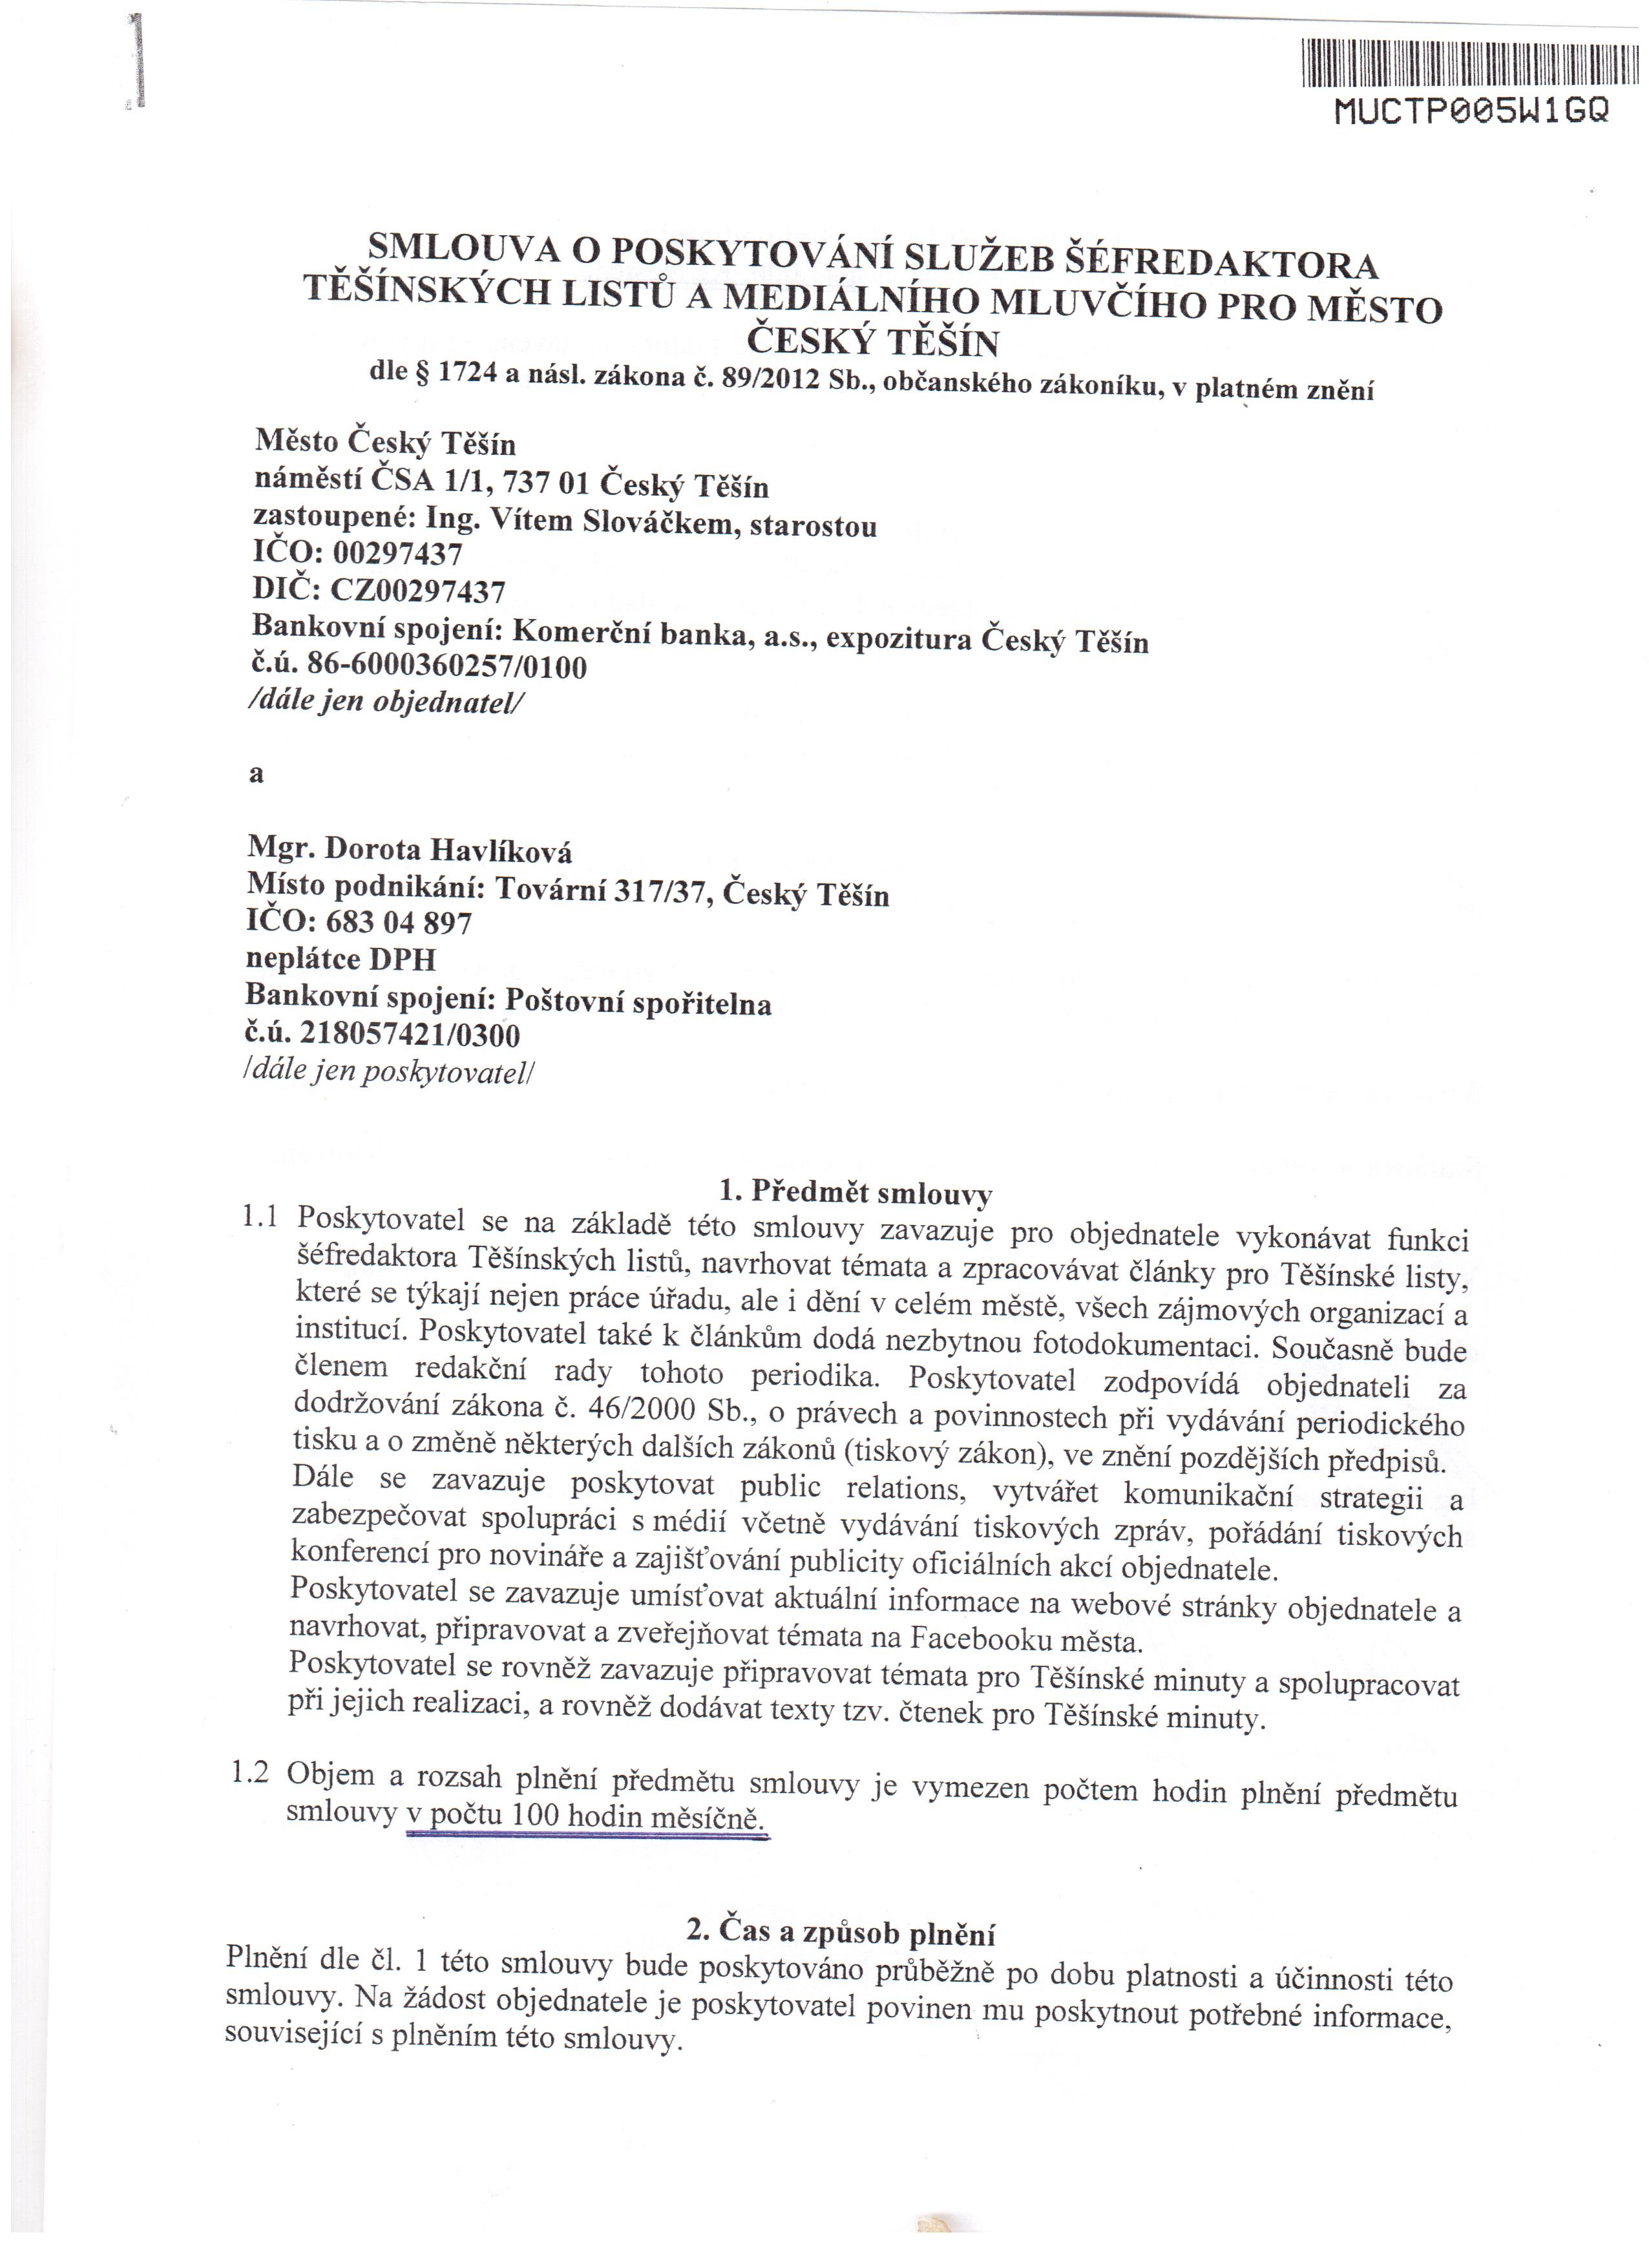 smlouva-havl1-001.jpg